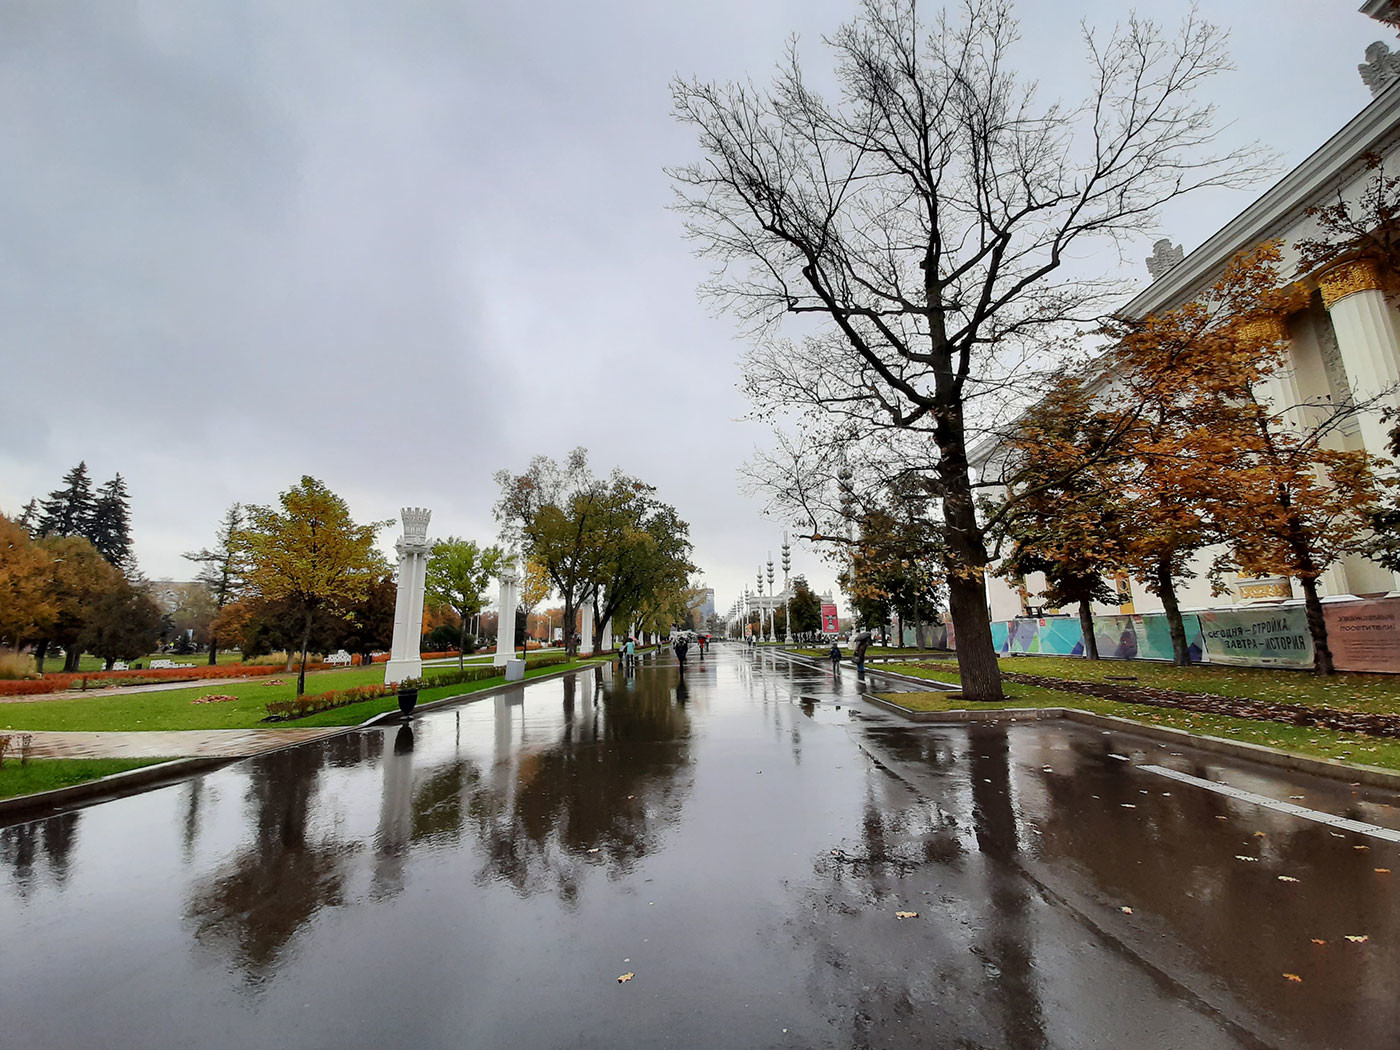 Ширик. Фото © Роман Кильдюшкин